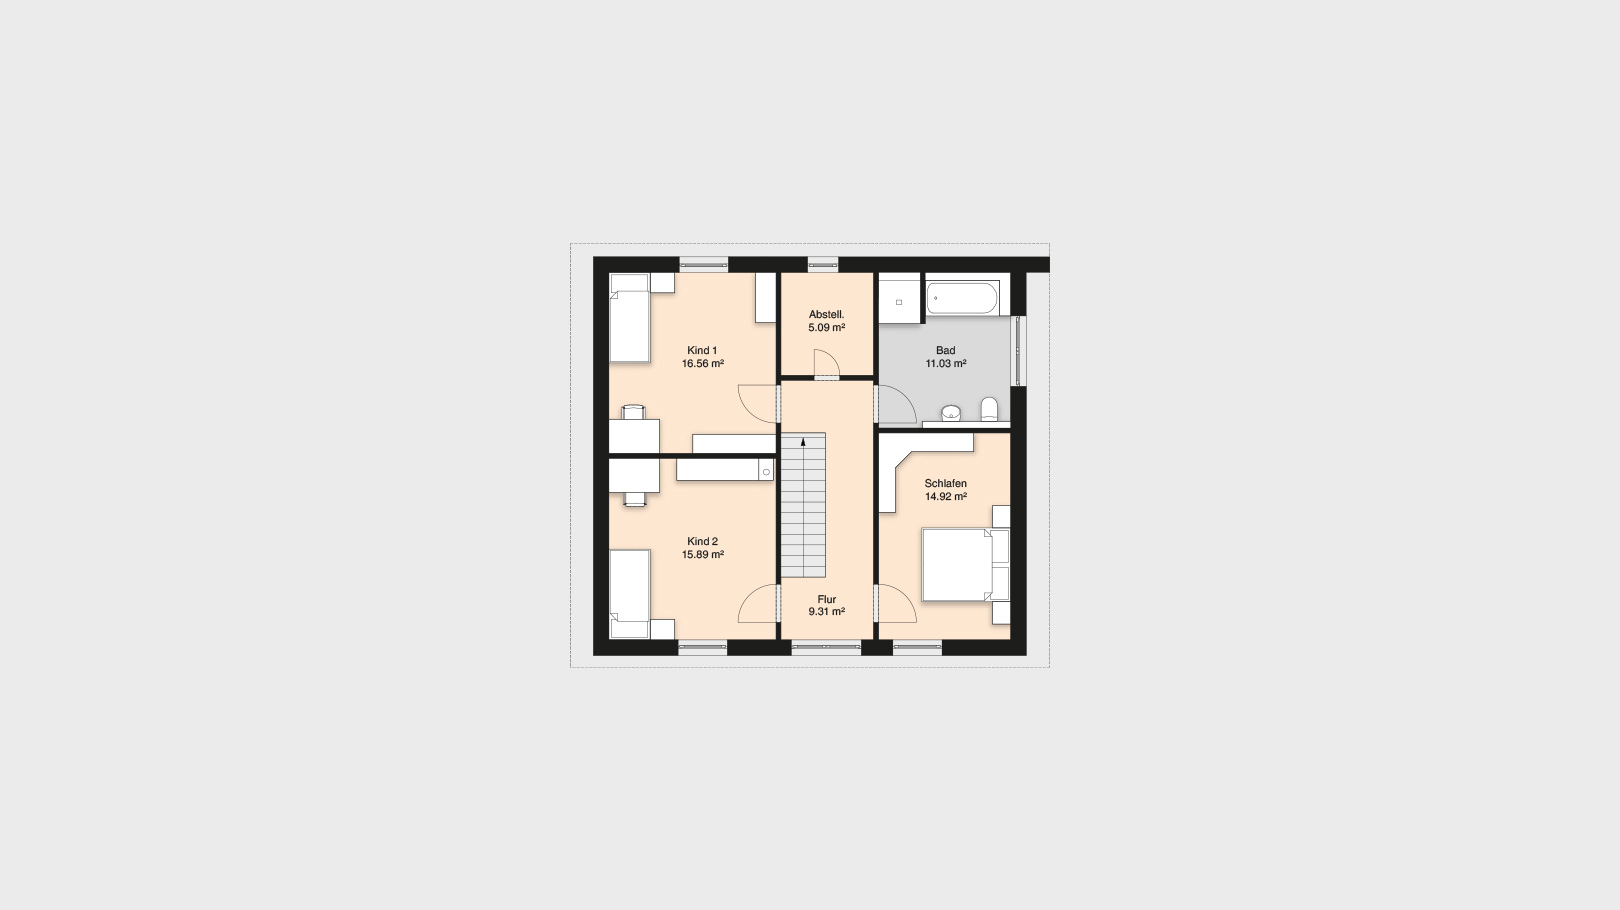 Haus-Idee Jena